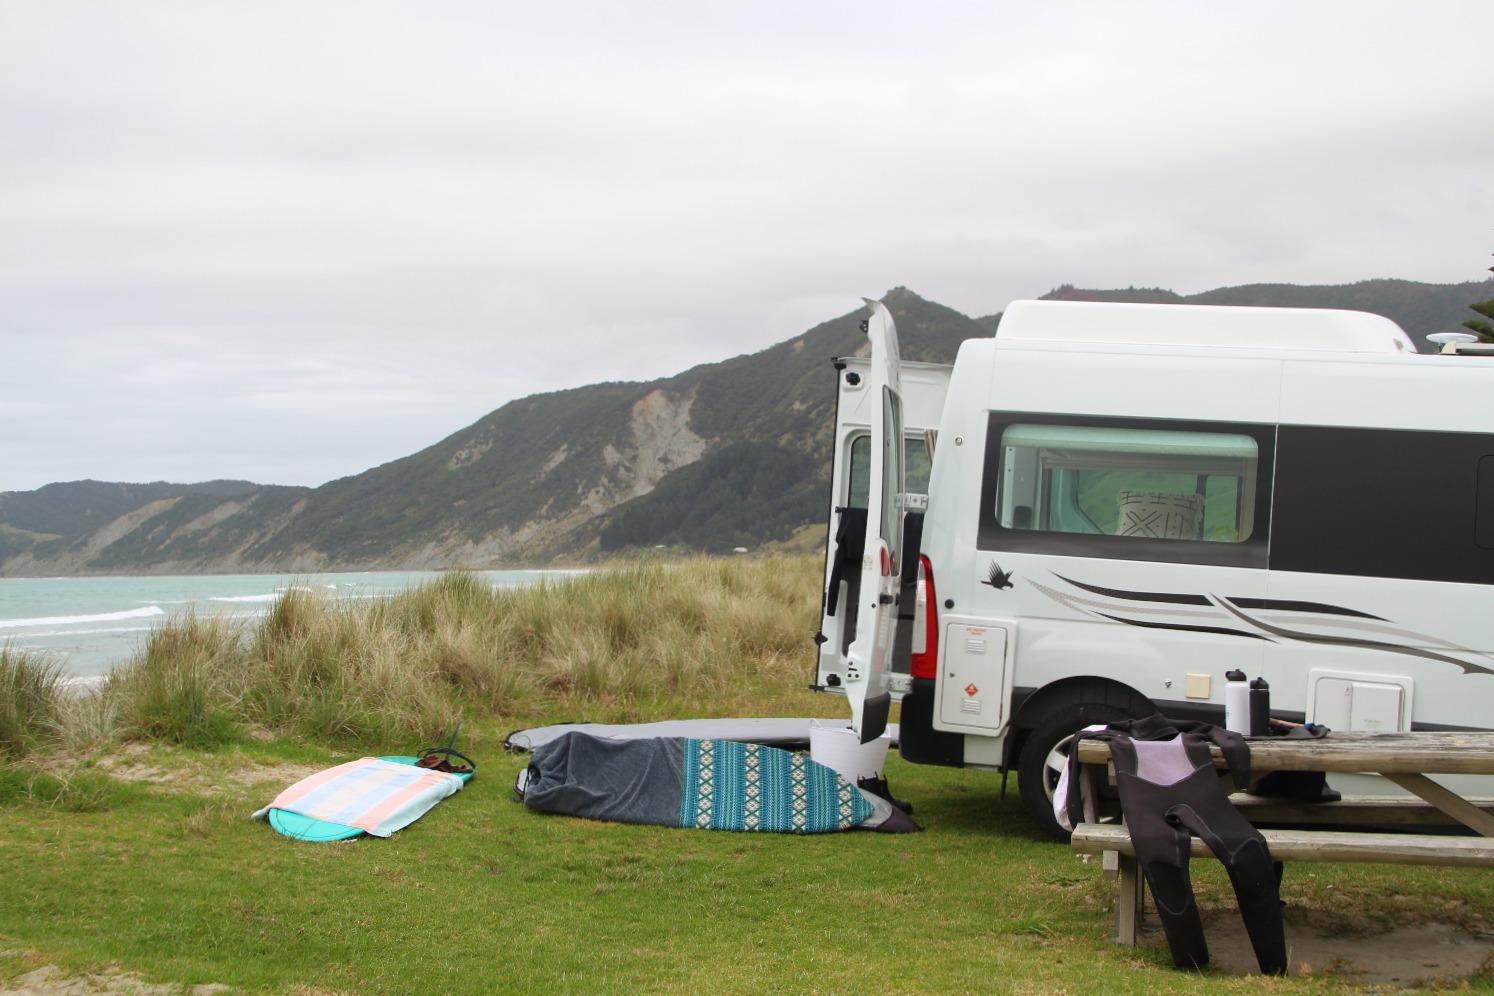 Dawny Campervan Trip